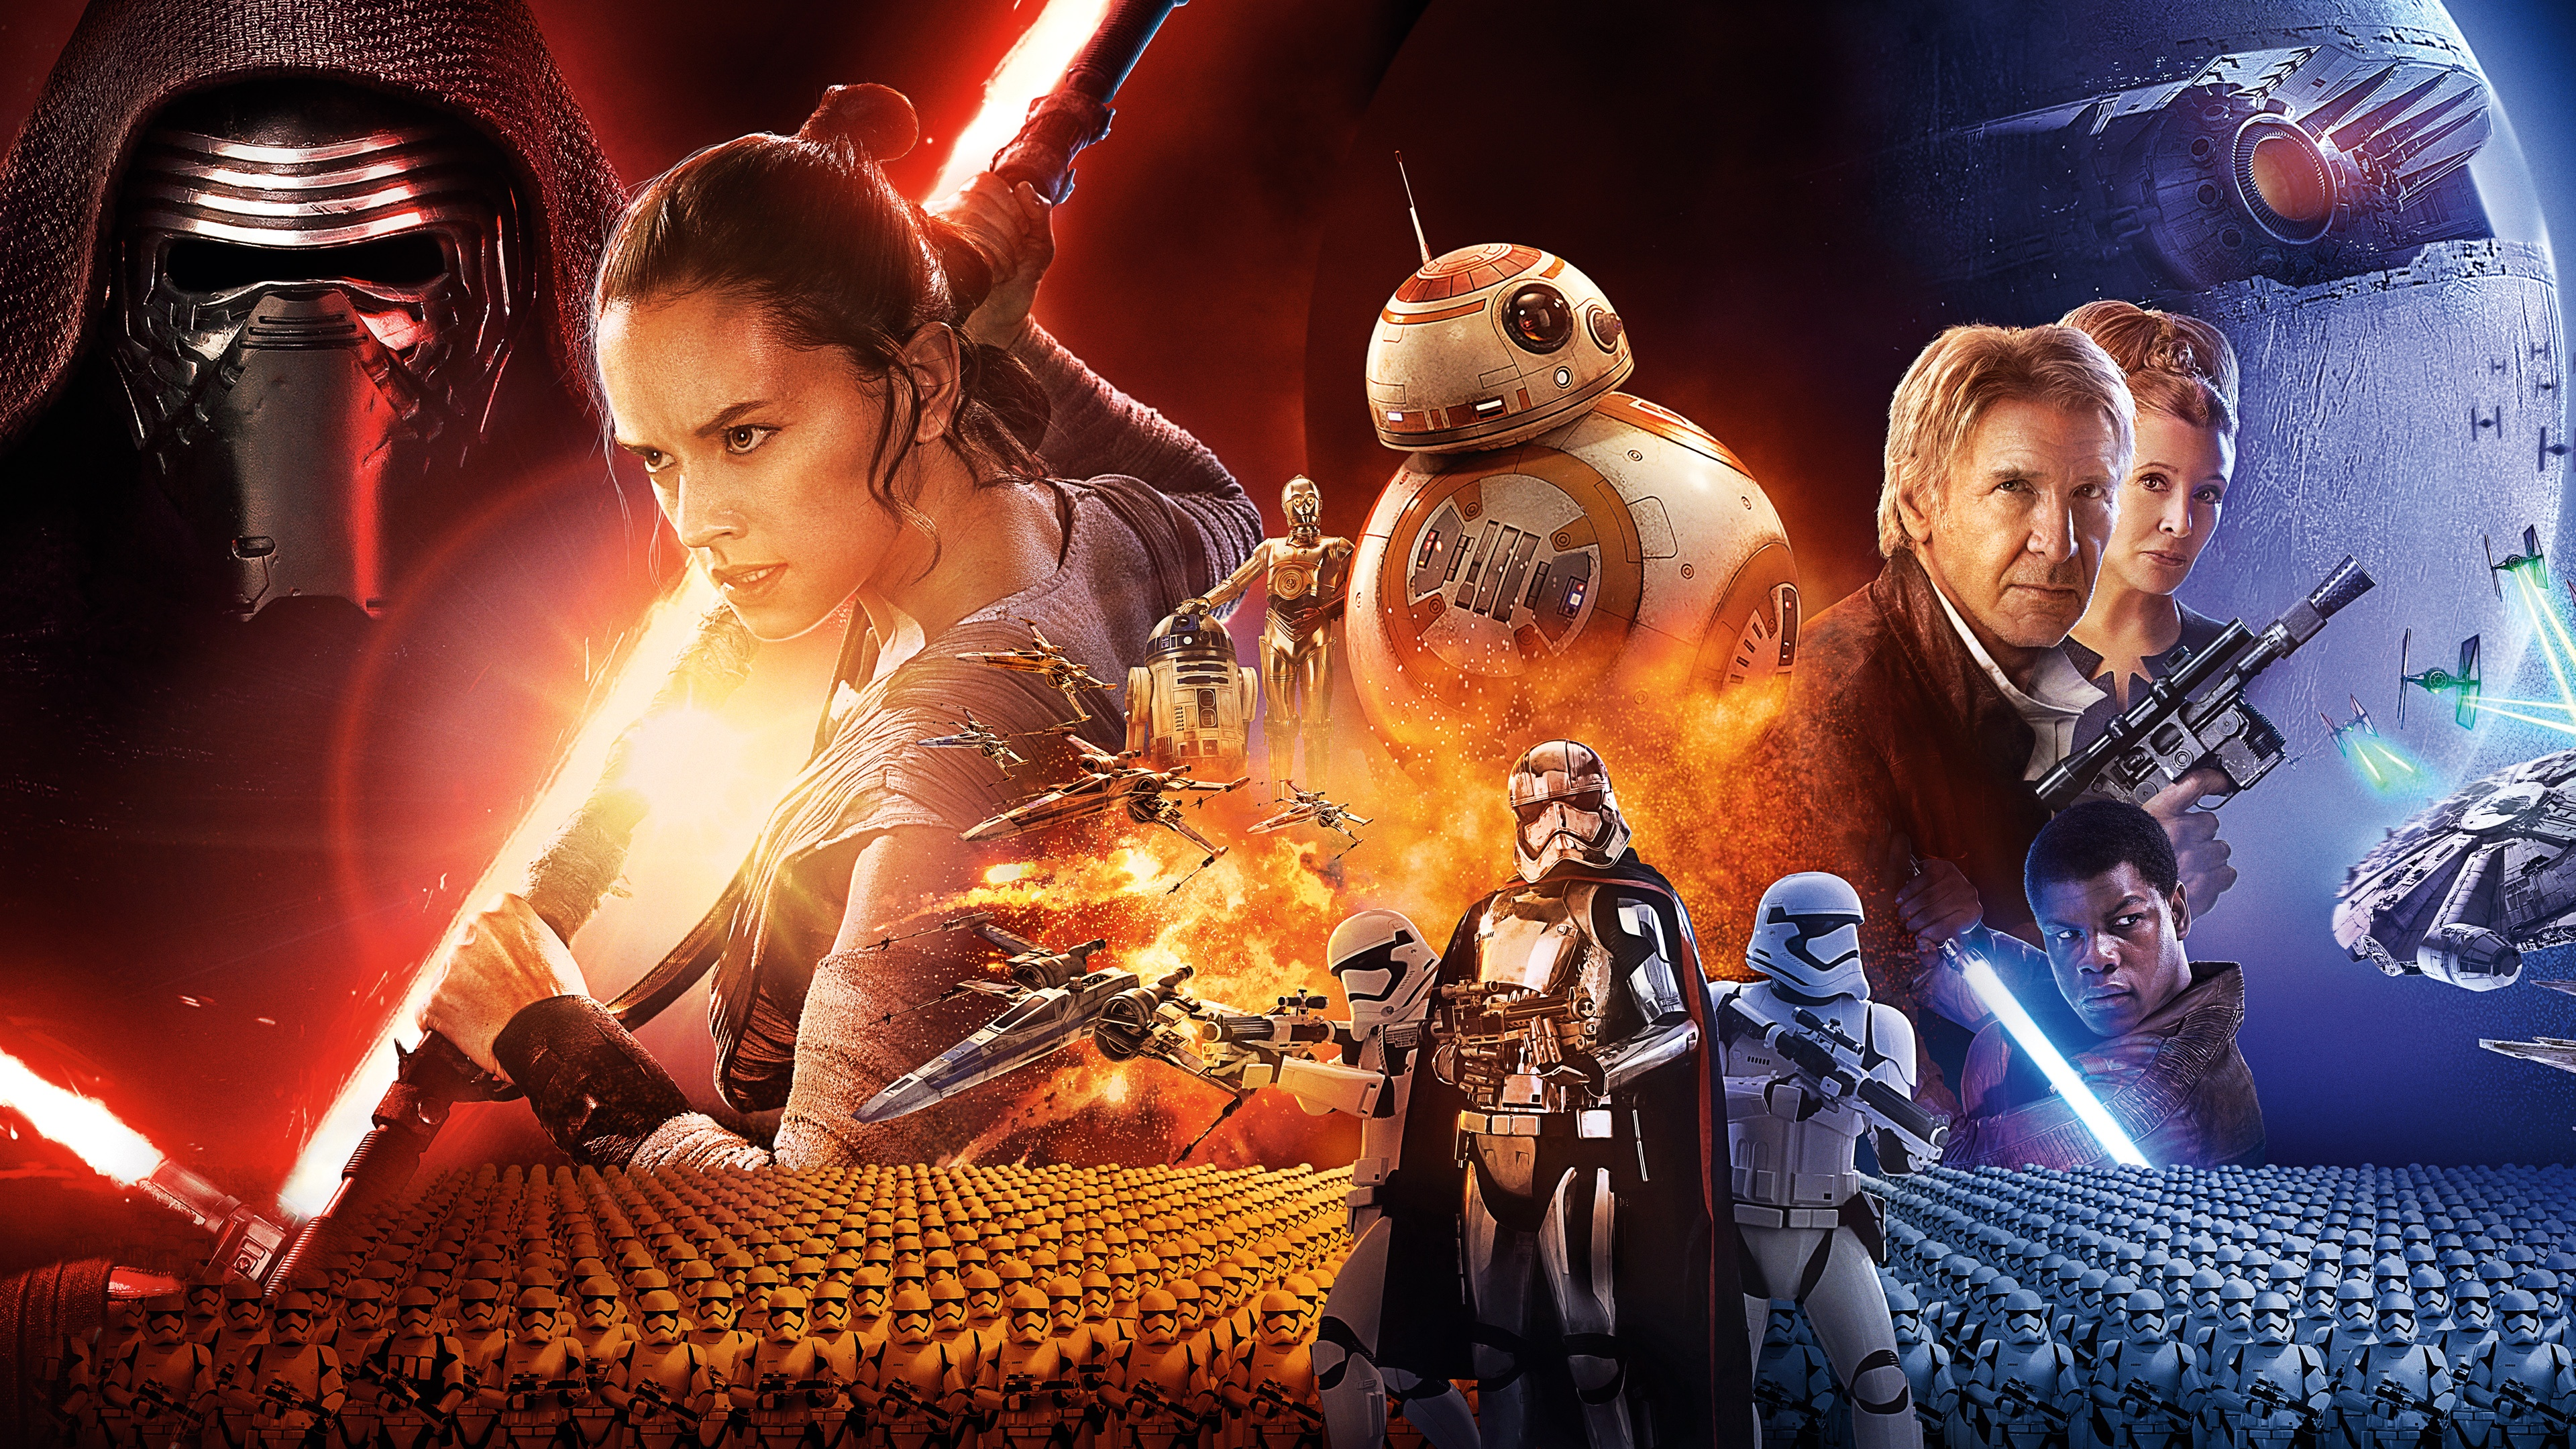 47 Star Wars 4k Wallpaper On Wallpapersafari